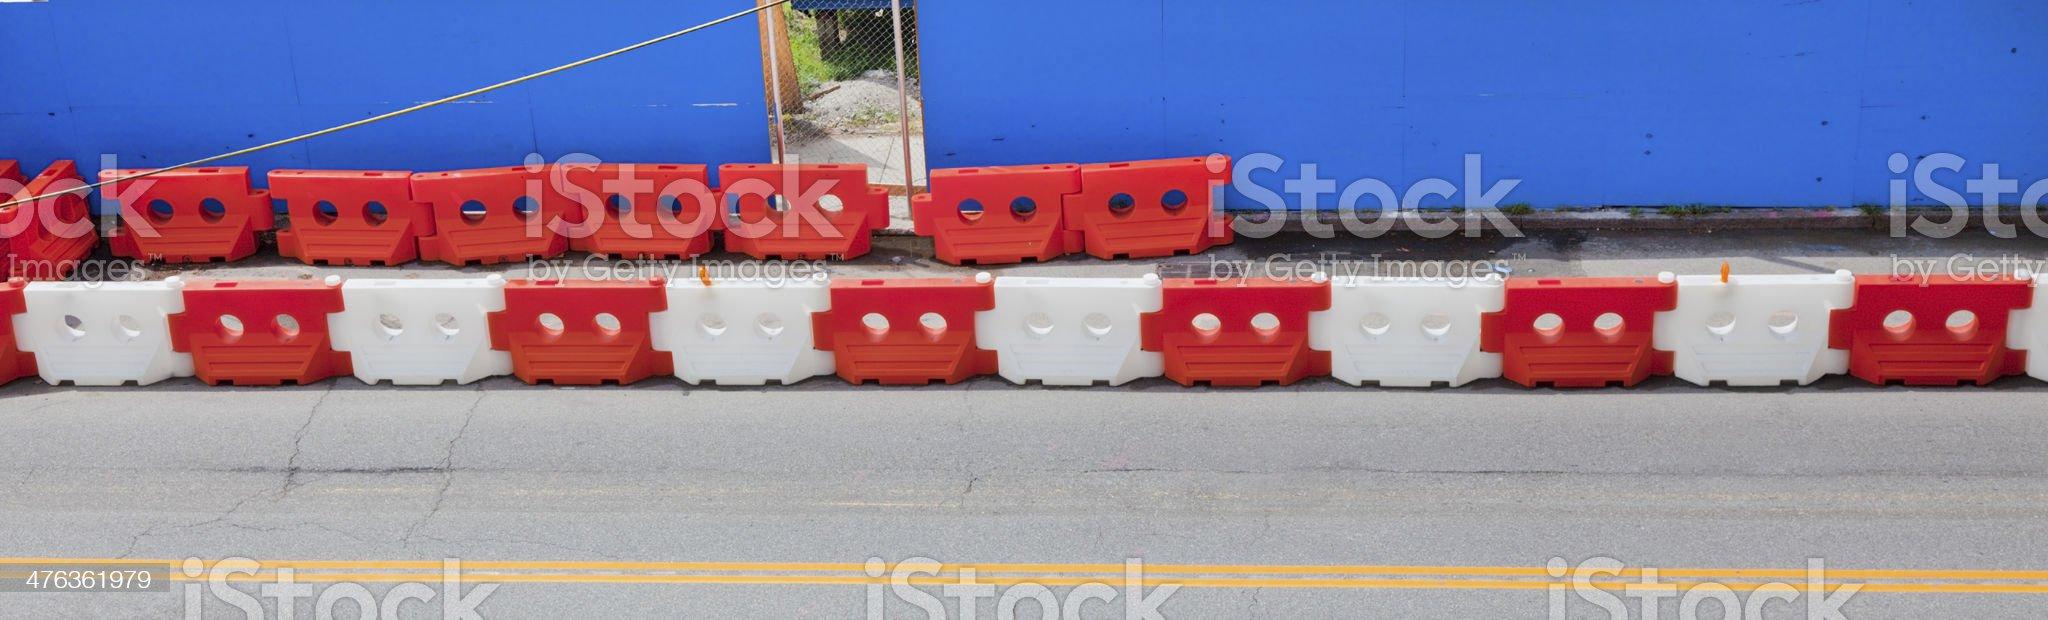 Construction Barricade royalty-free stock photo